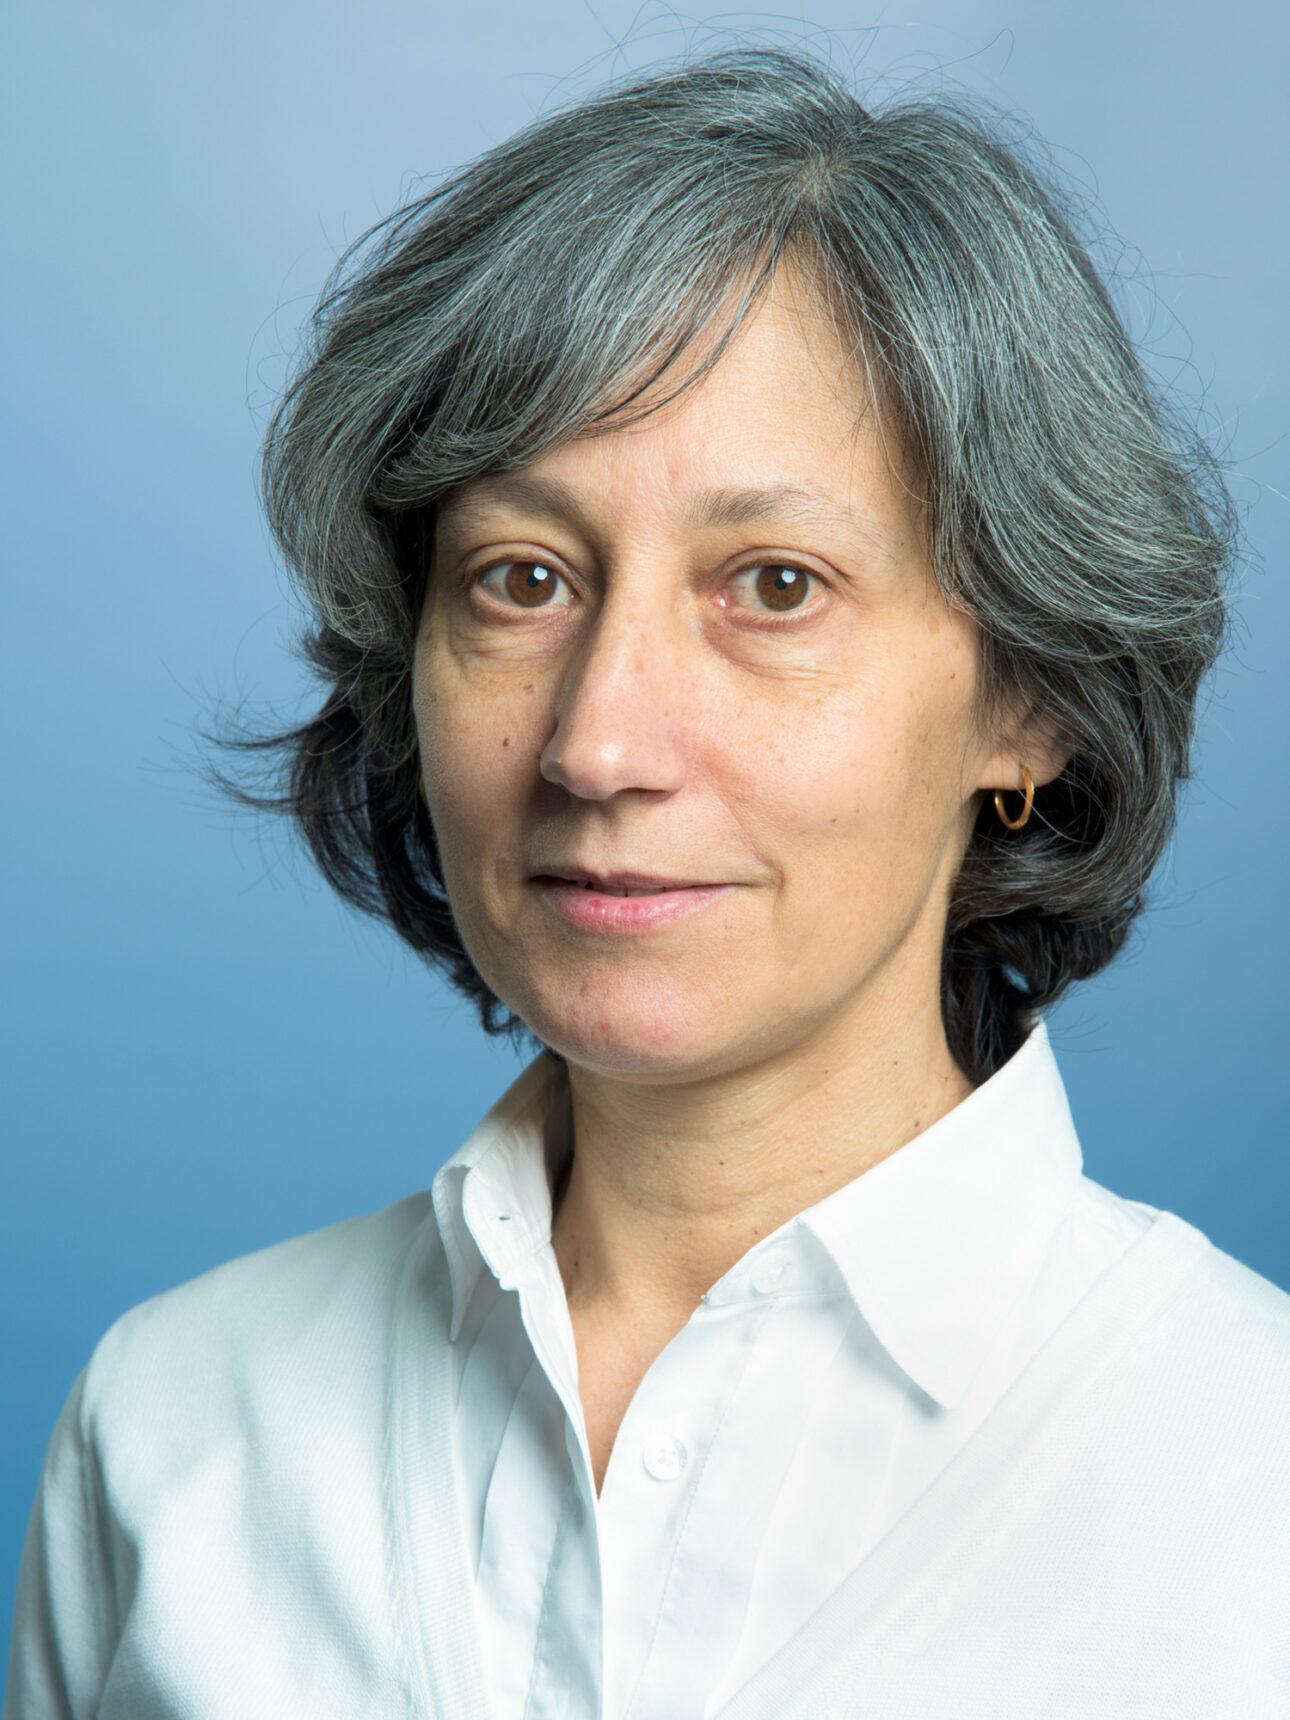 Photo of Gabriela Gomes against a blue background